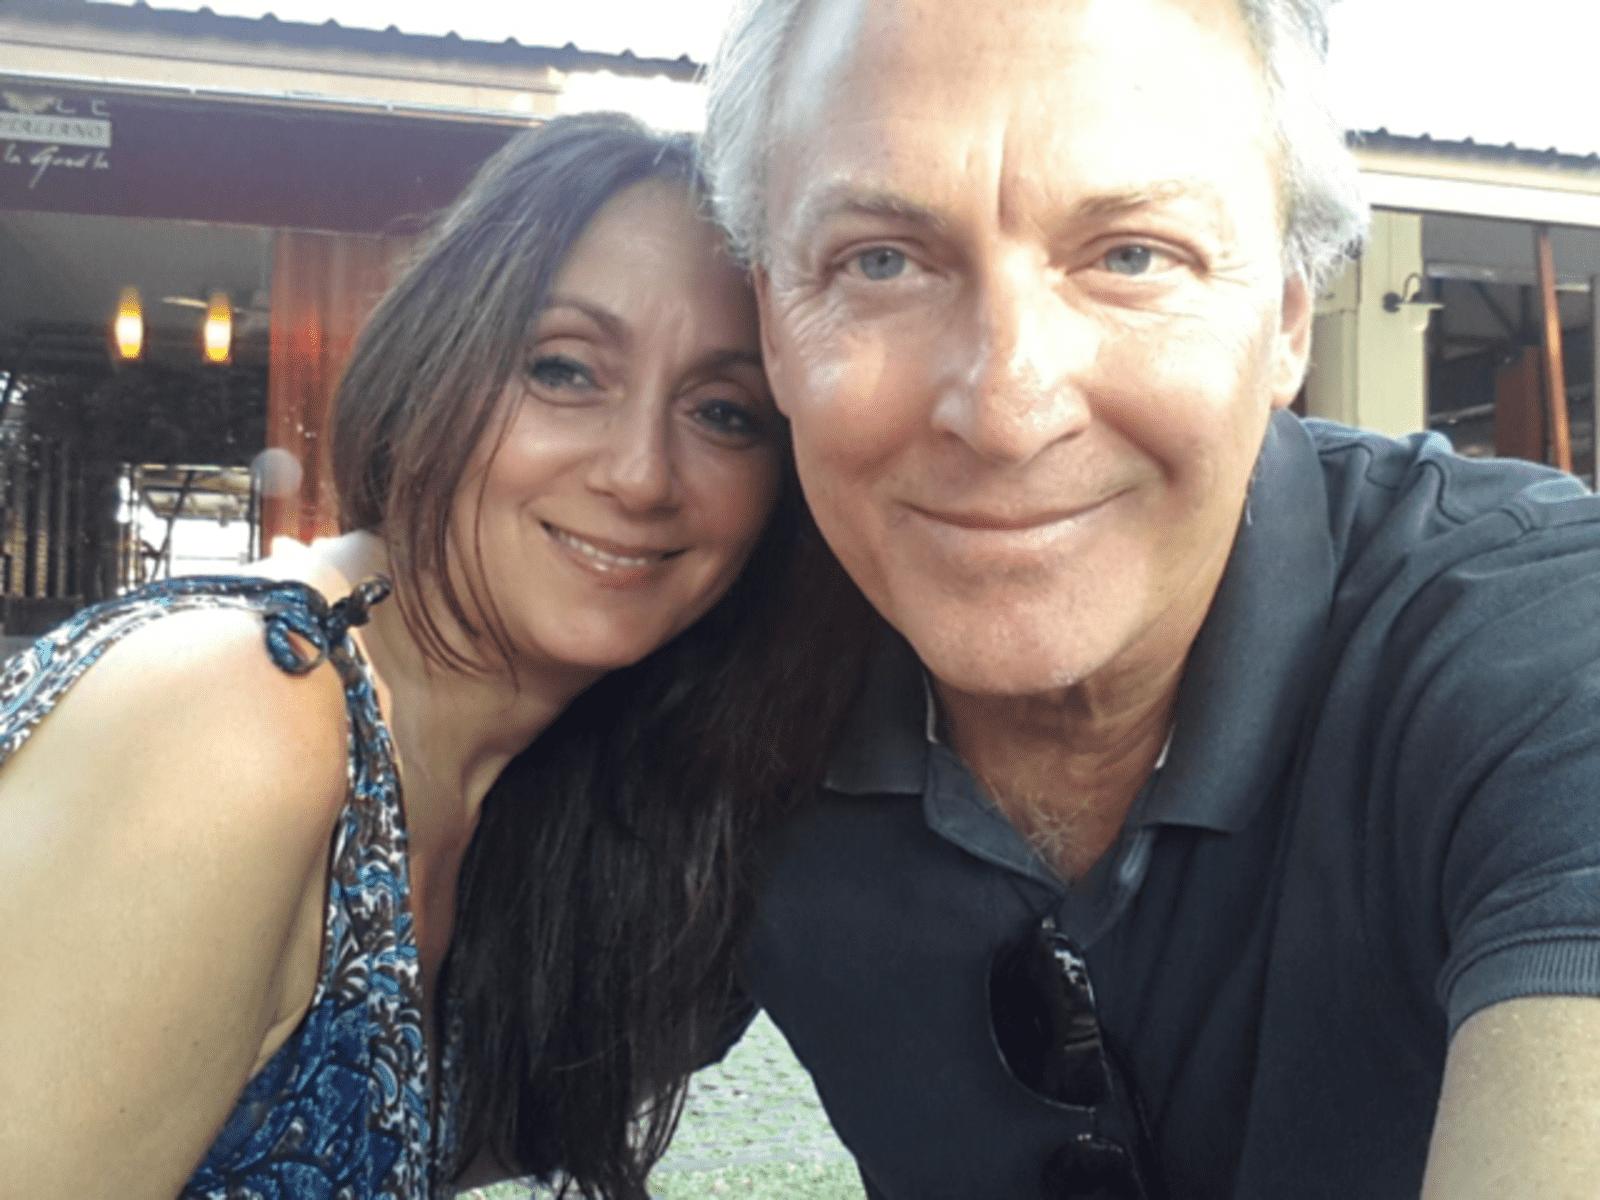 Deborah & Guy from Cardiff, United Kingdom